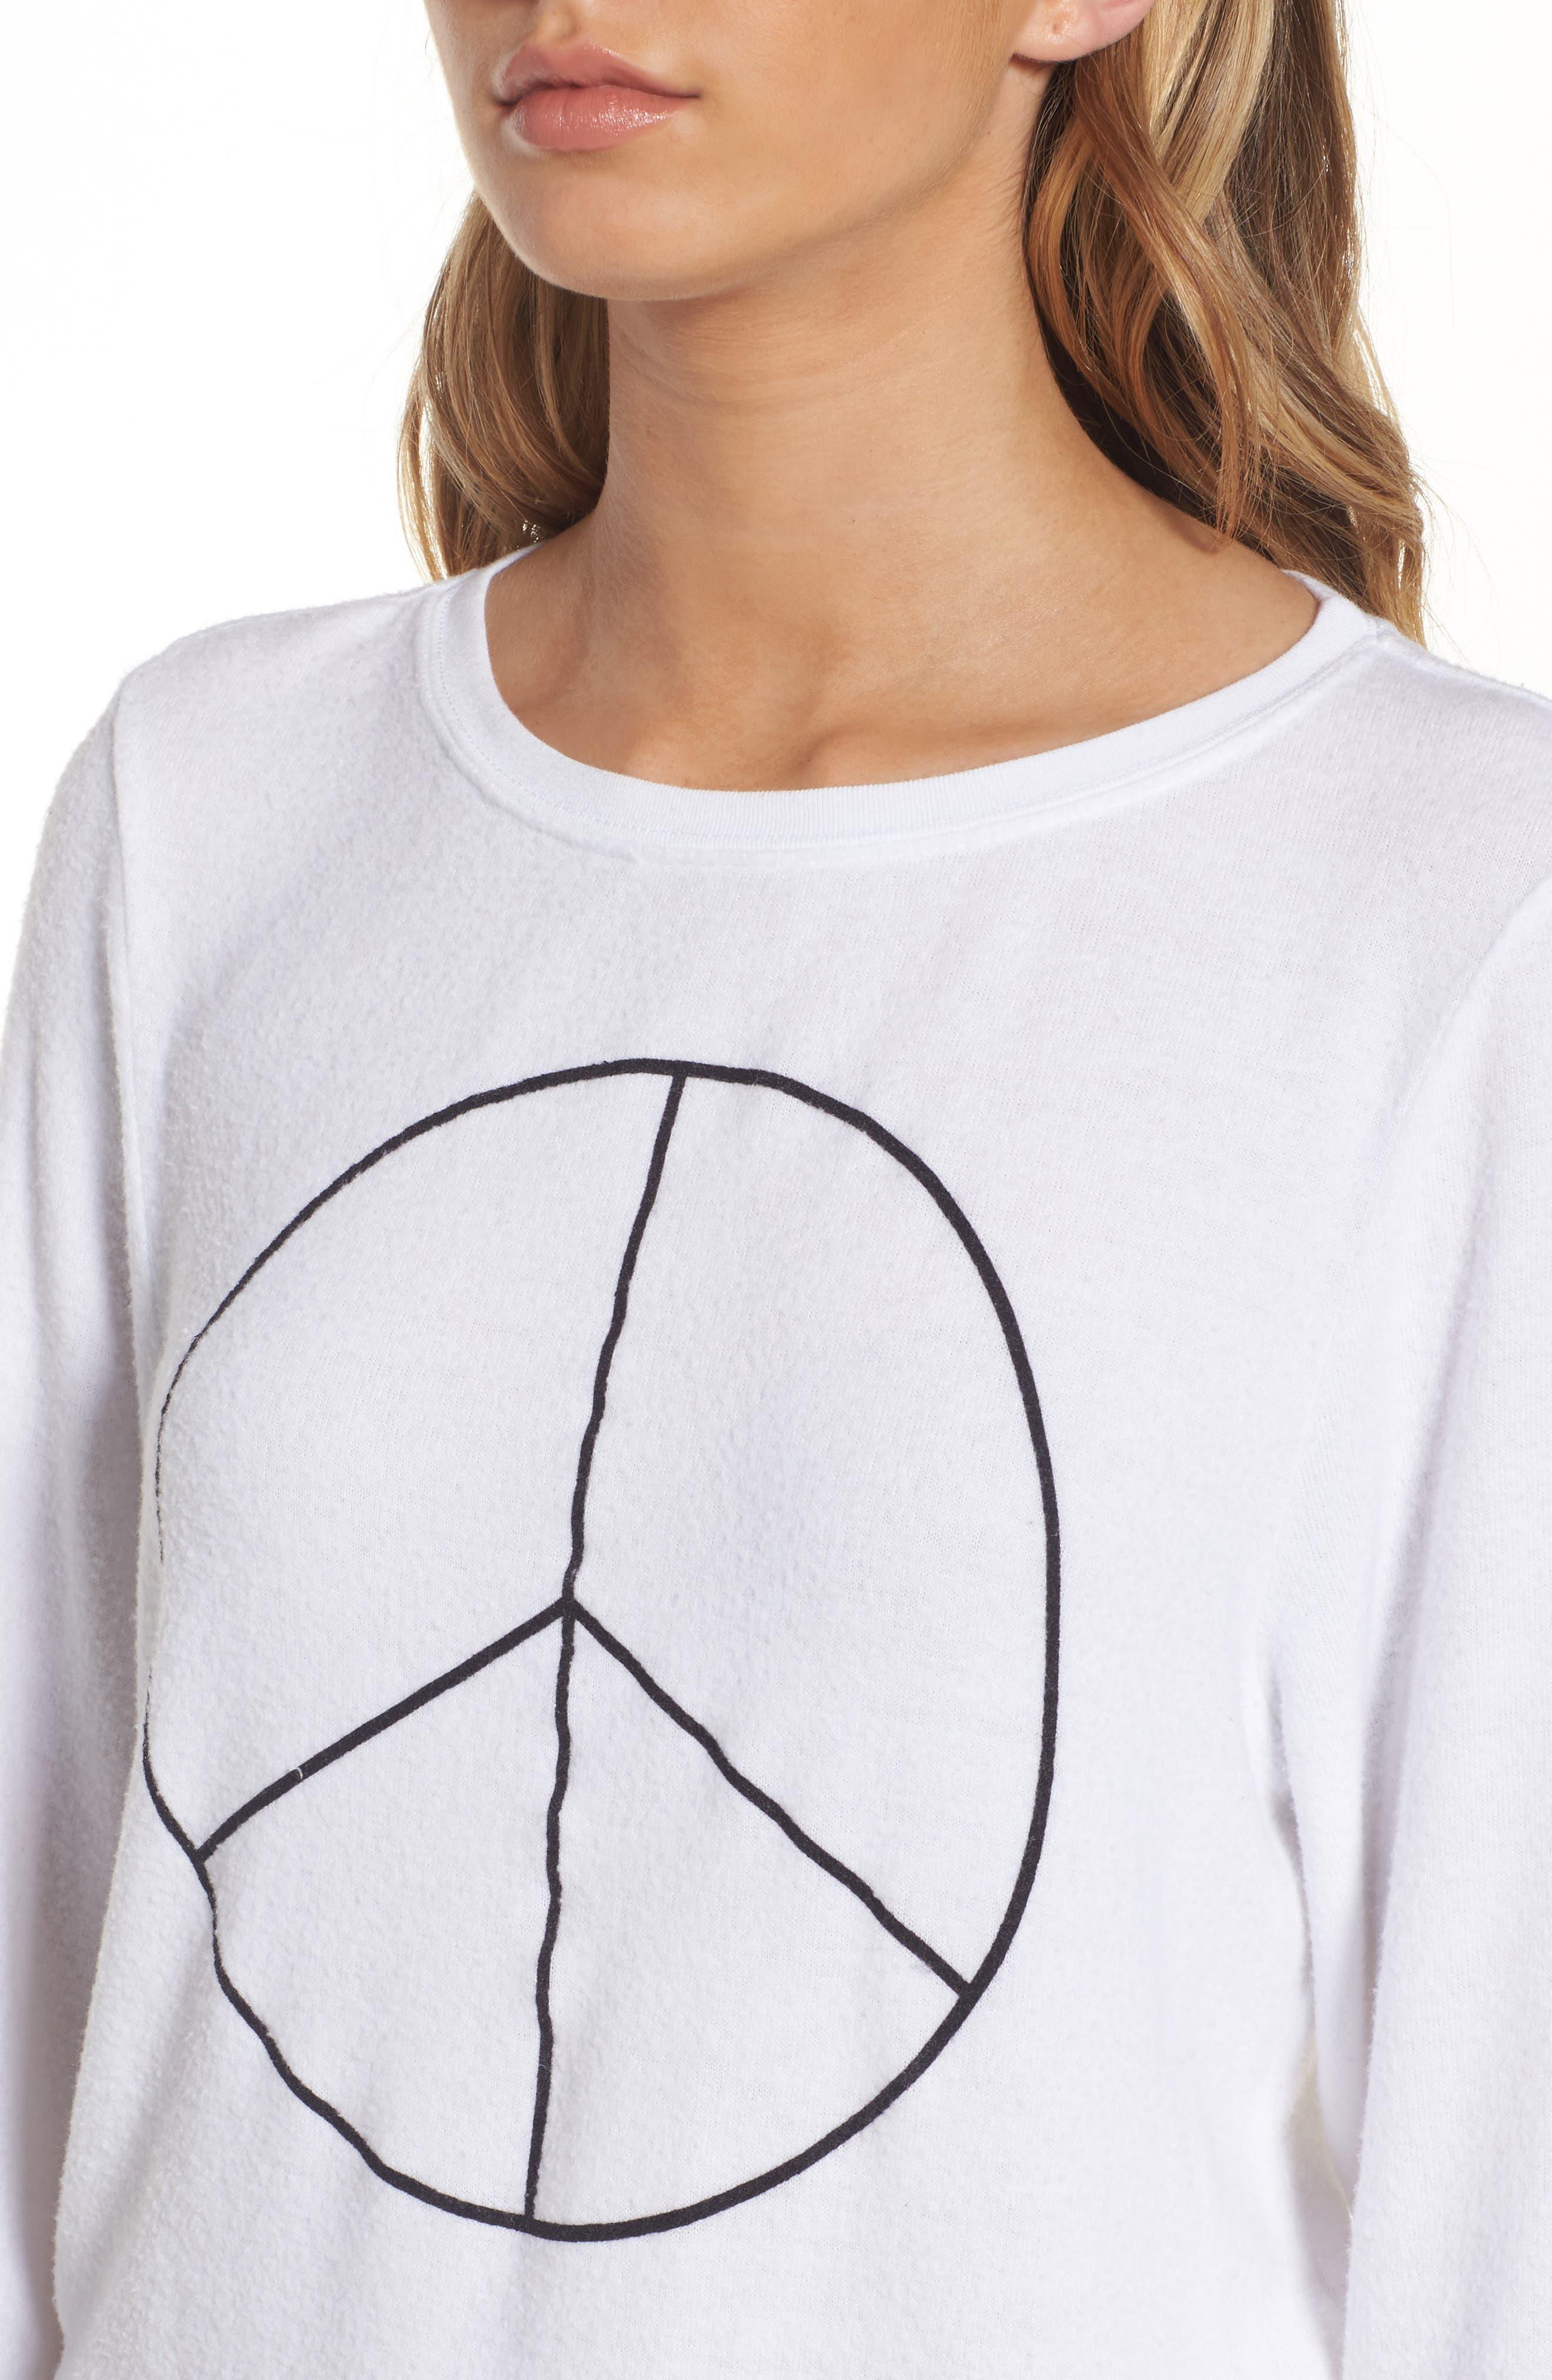 Peace Sweatshirt,                             Alternate thumbnail 4, color,                             White